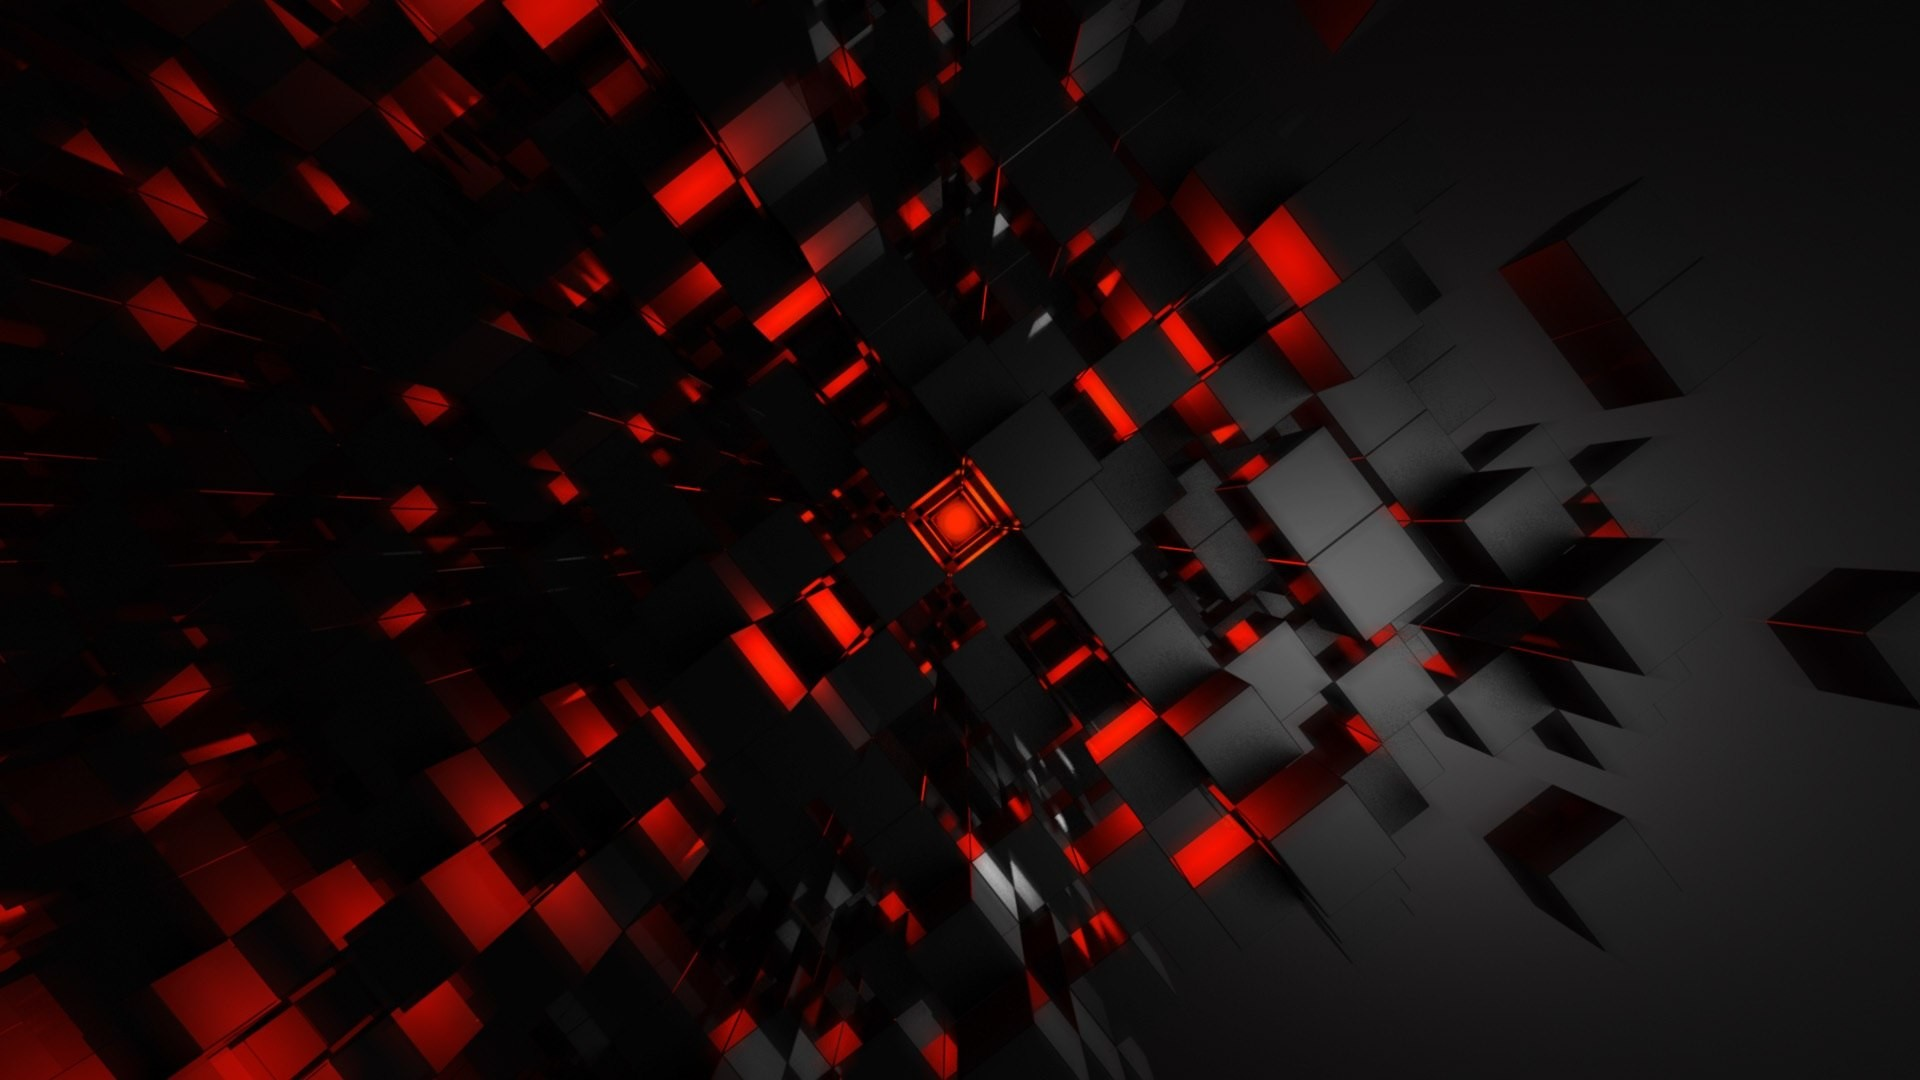 Res: 1920x1080, 10. red-desktop-wallpaper3-600x338